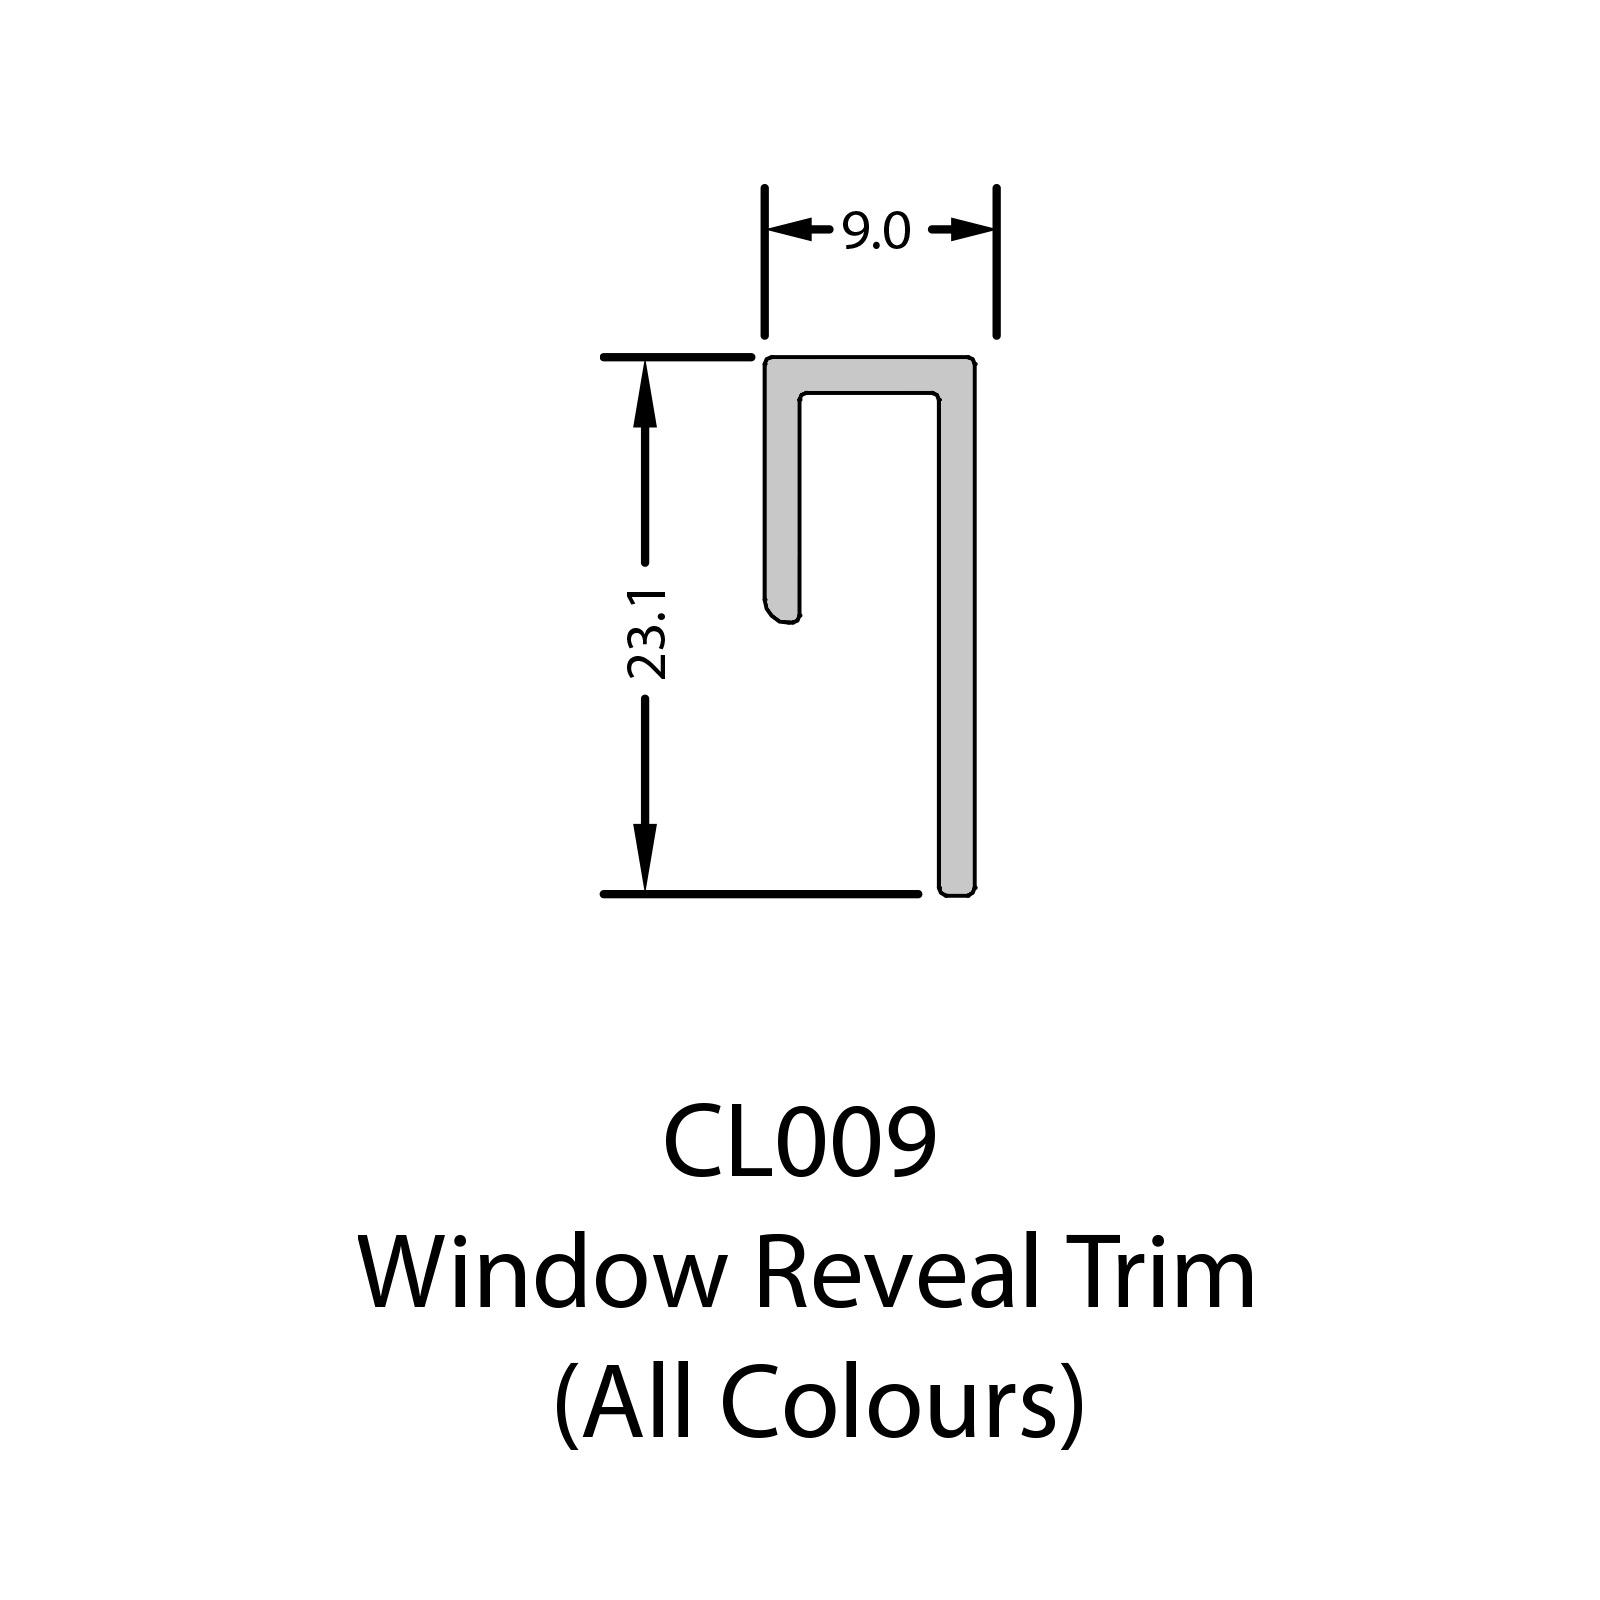 5m Window Reveal Trim For Coastline Shiplap Cladding